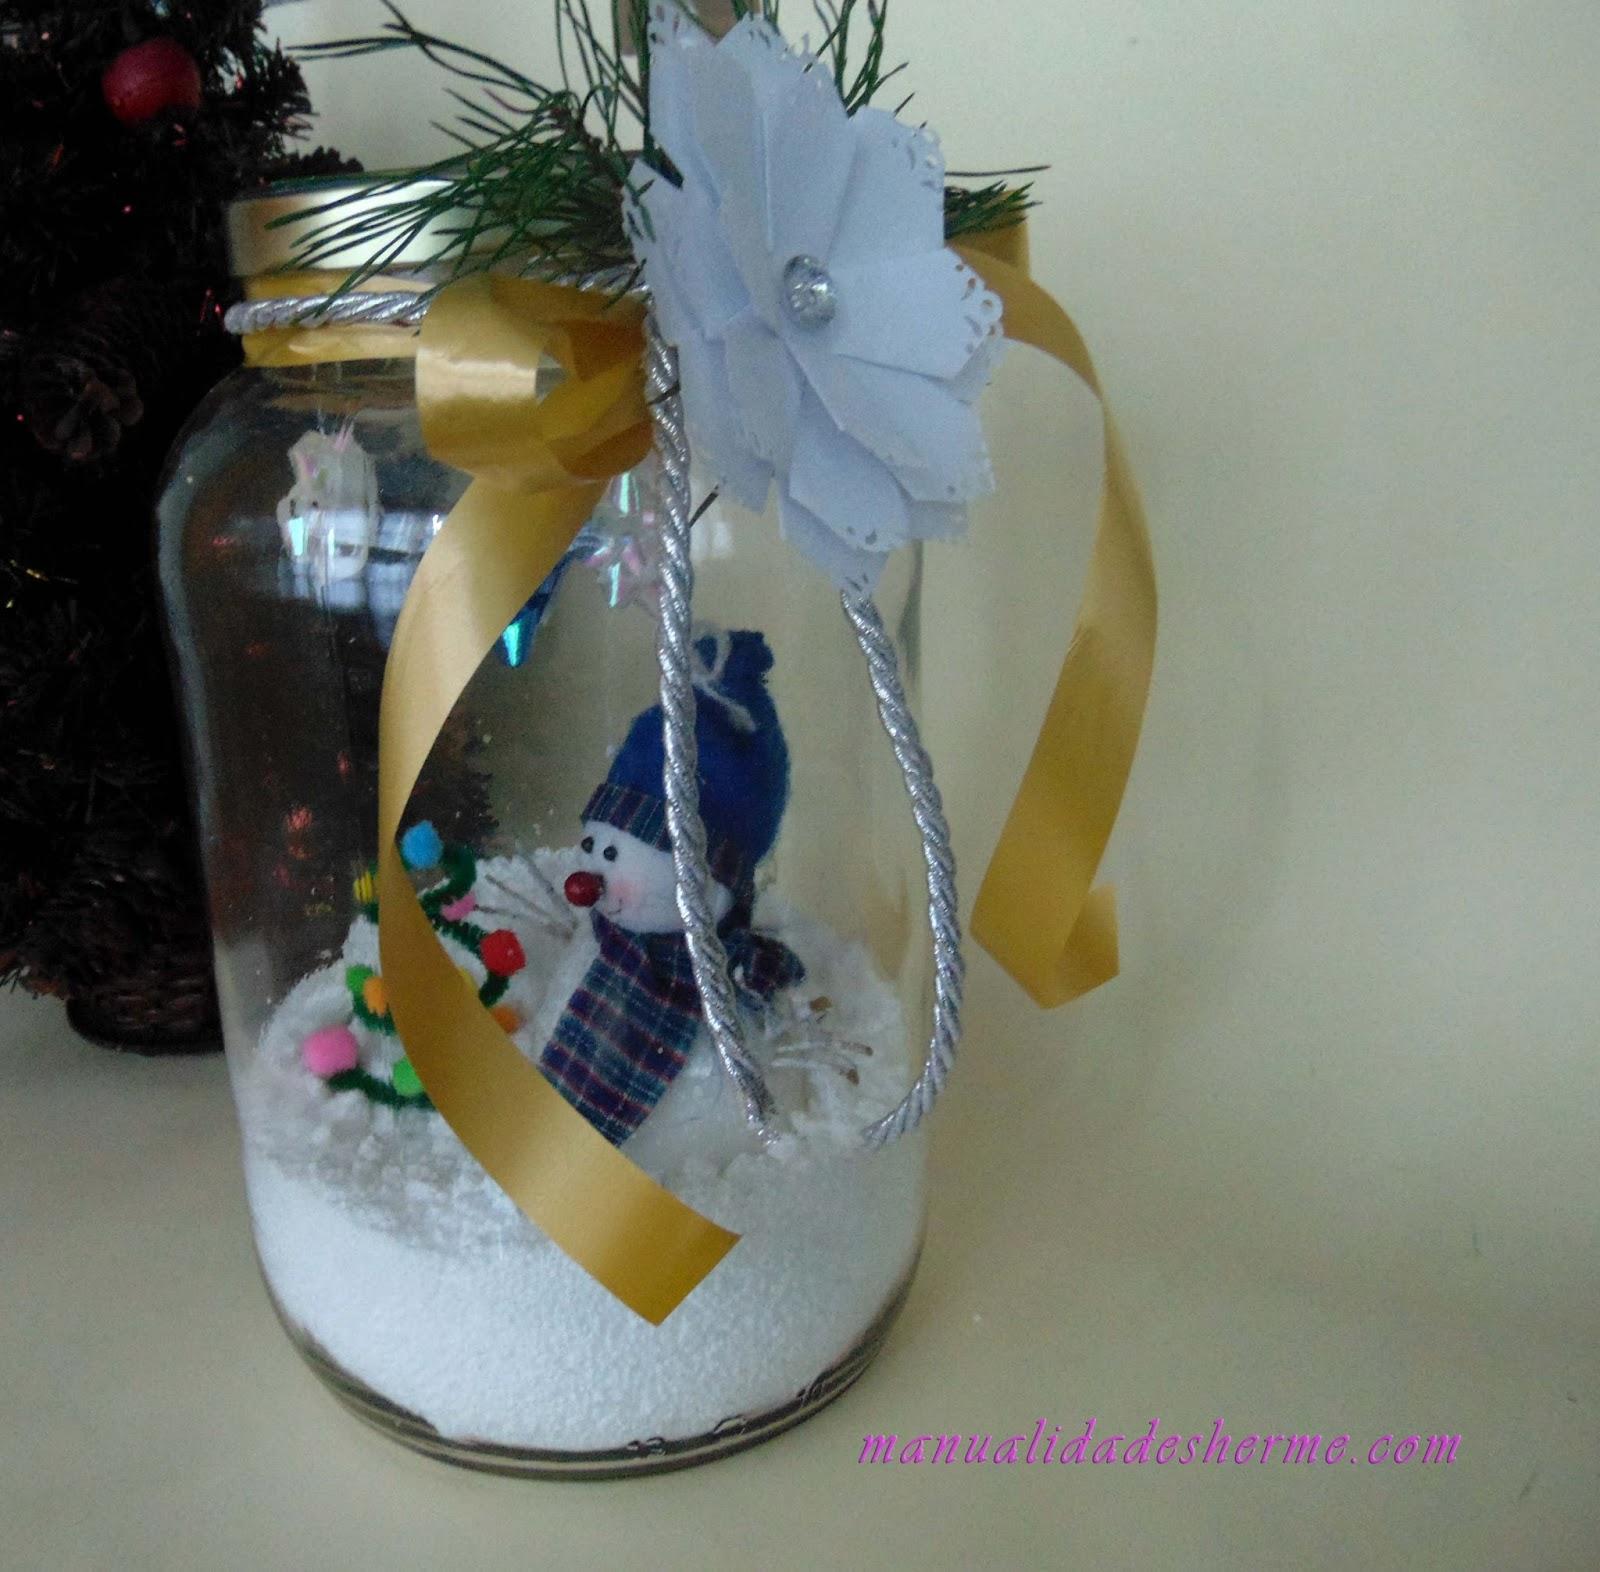 Manualidades herme como hacer un tarro decorado para navidad - Manualidades para hacer adornos navidenos ...